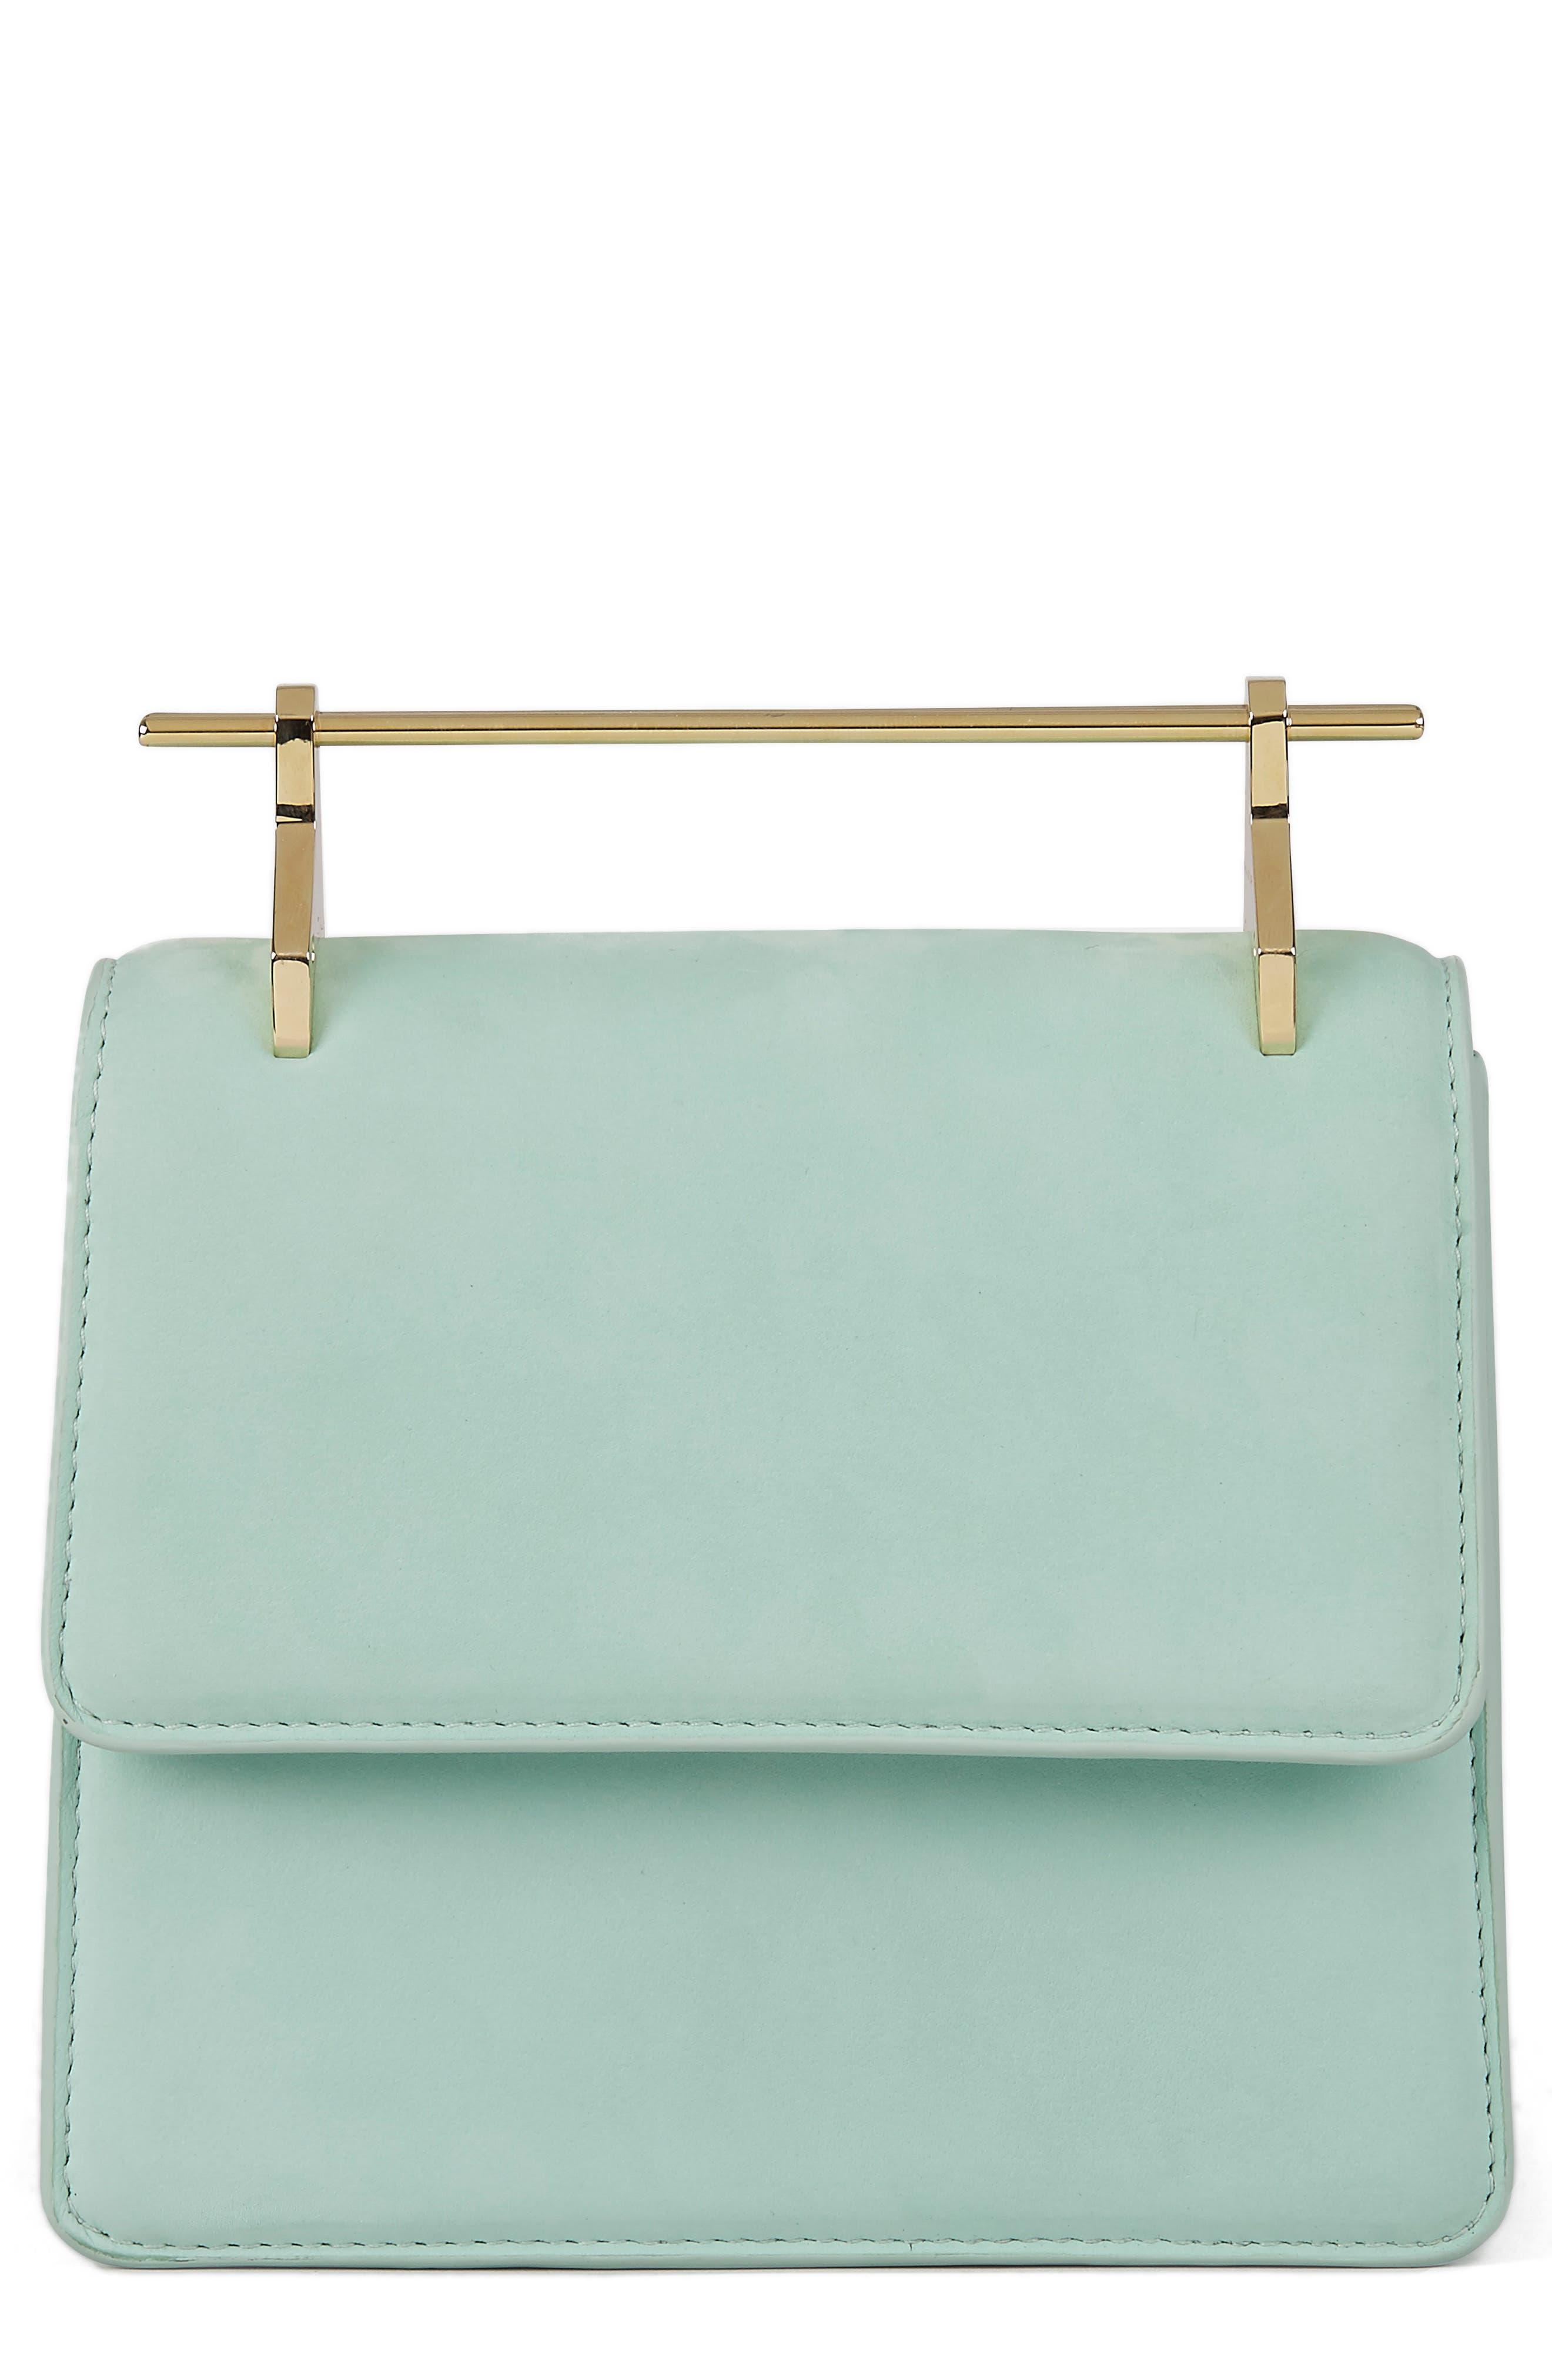 Mini La Collectionneuse Nubuck Crossbody Bag by M2 Malletier